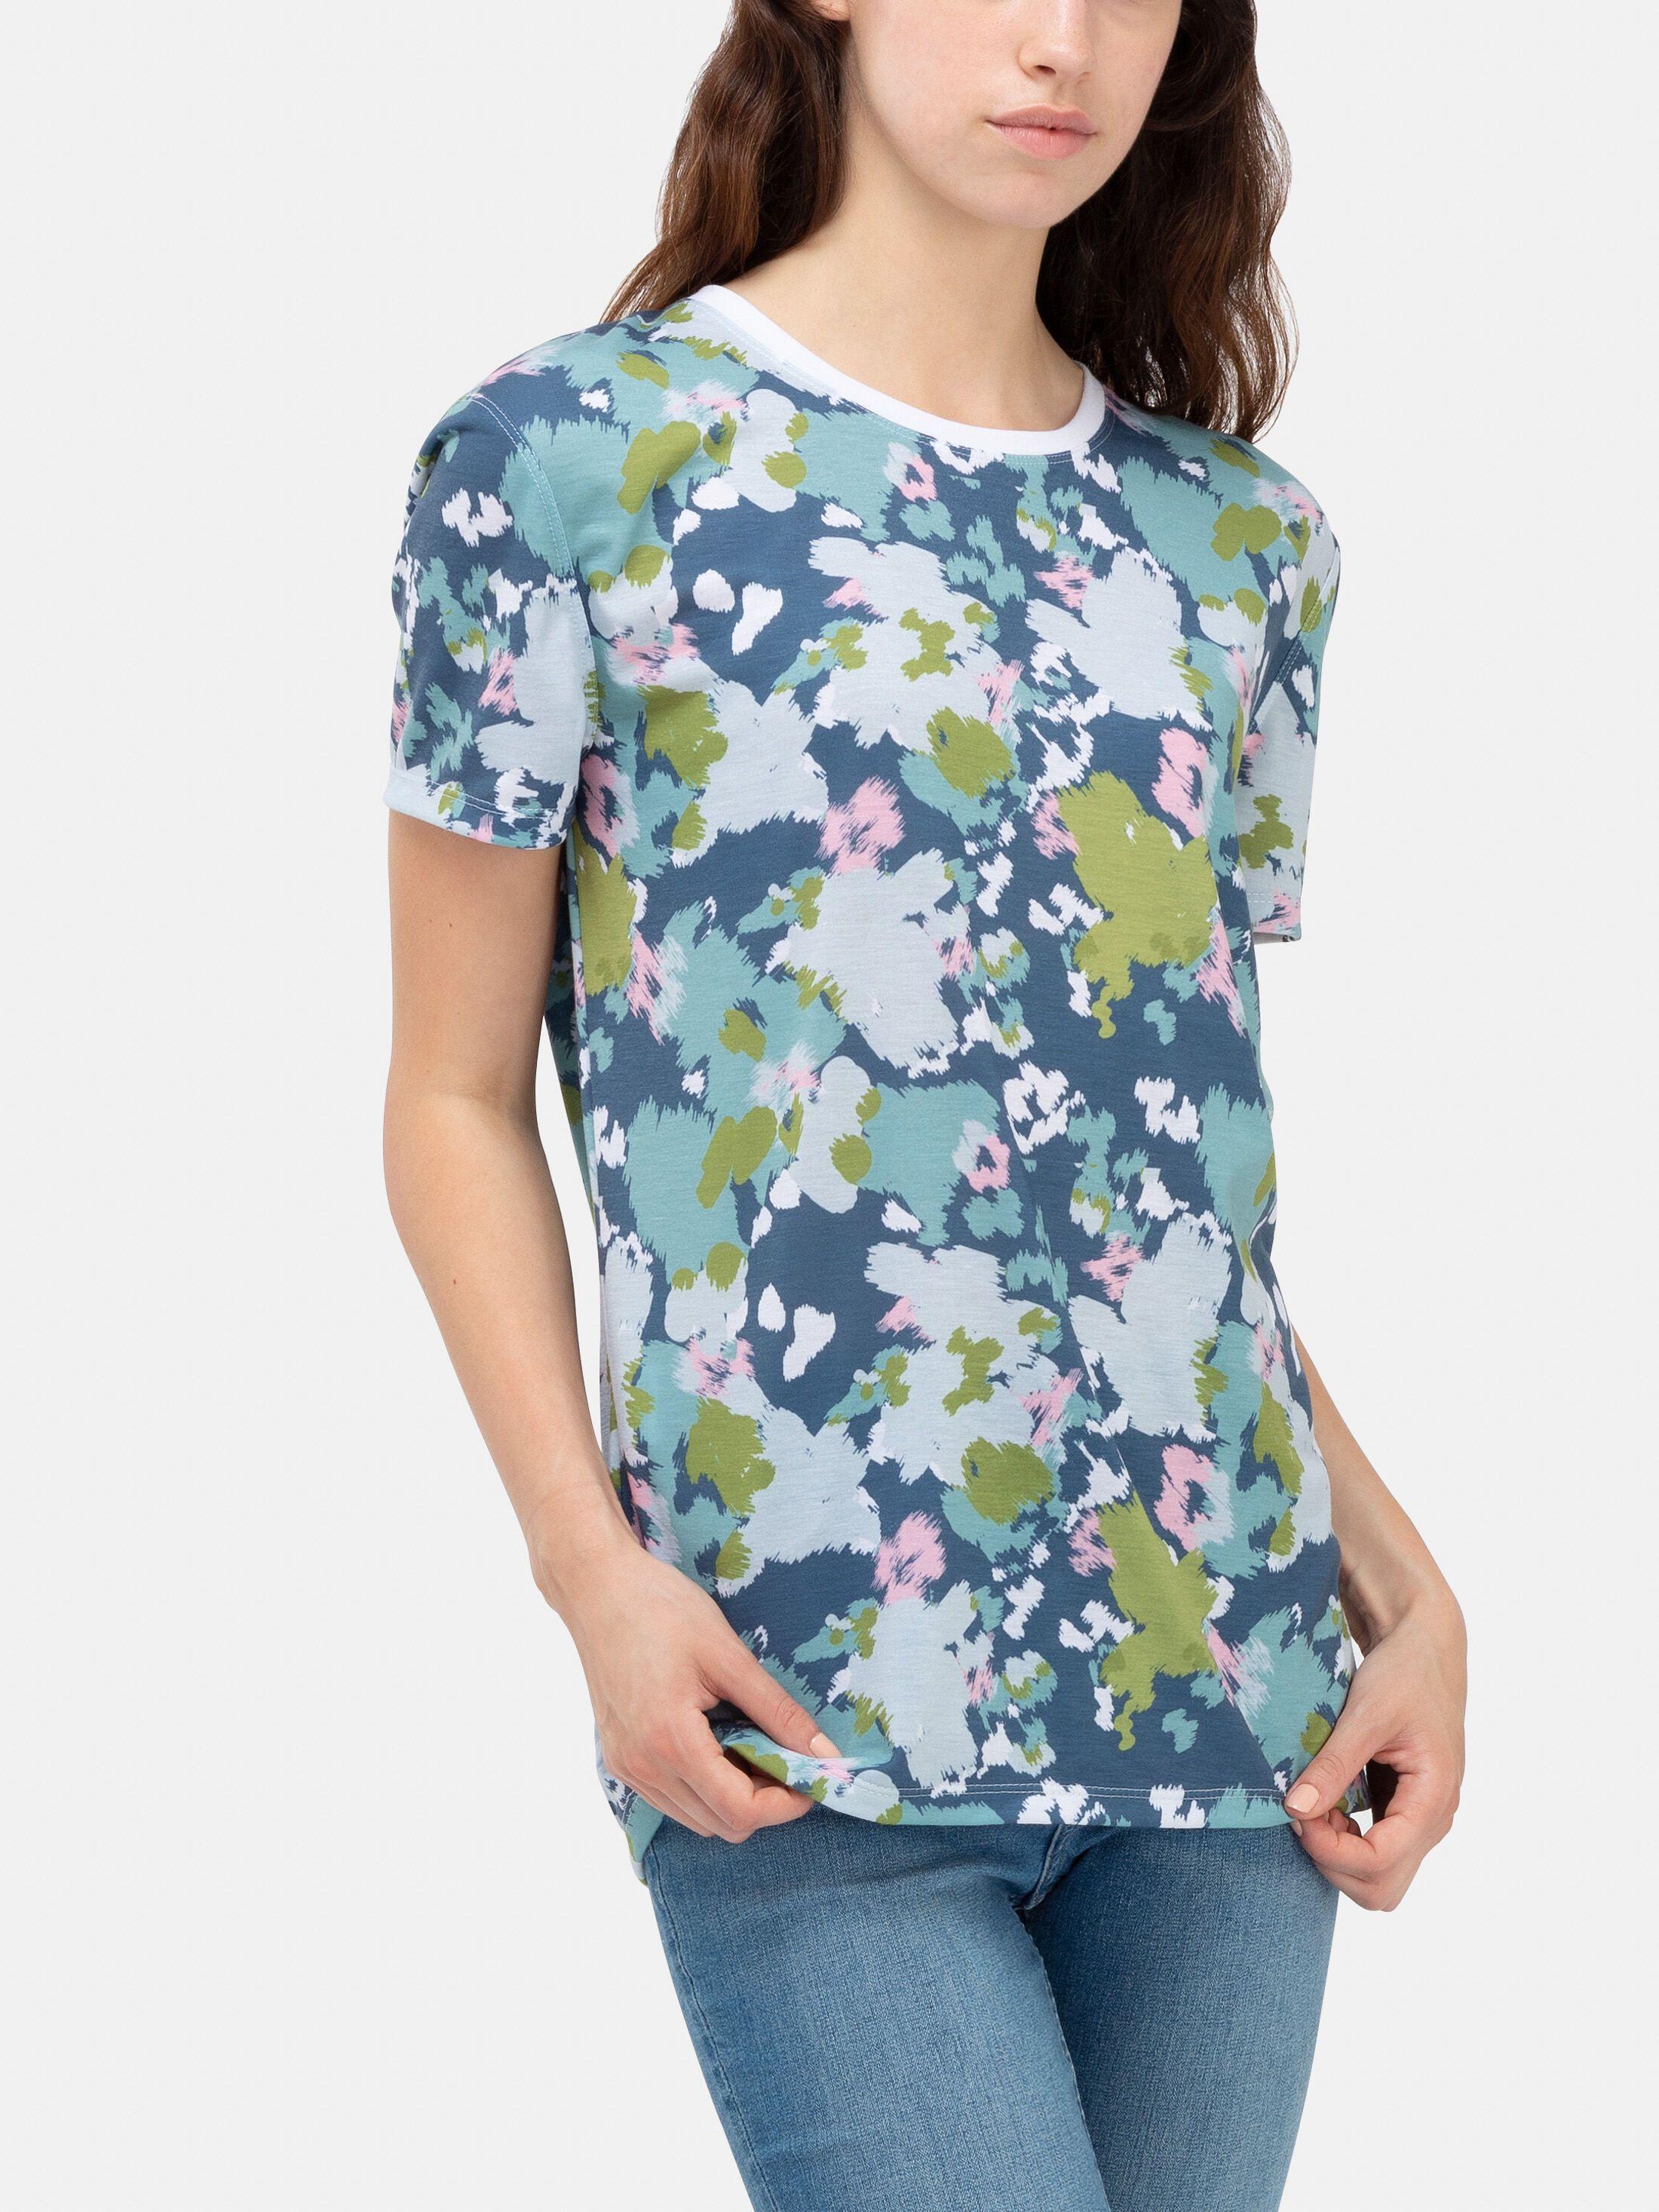 camiseta personalizada impresa bajo demanda